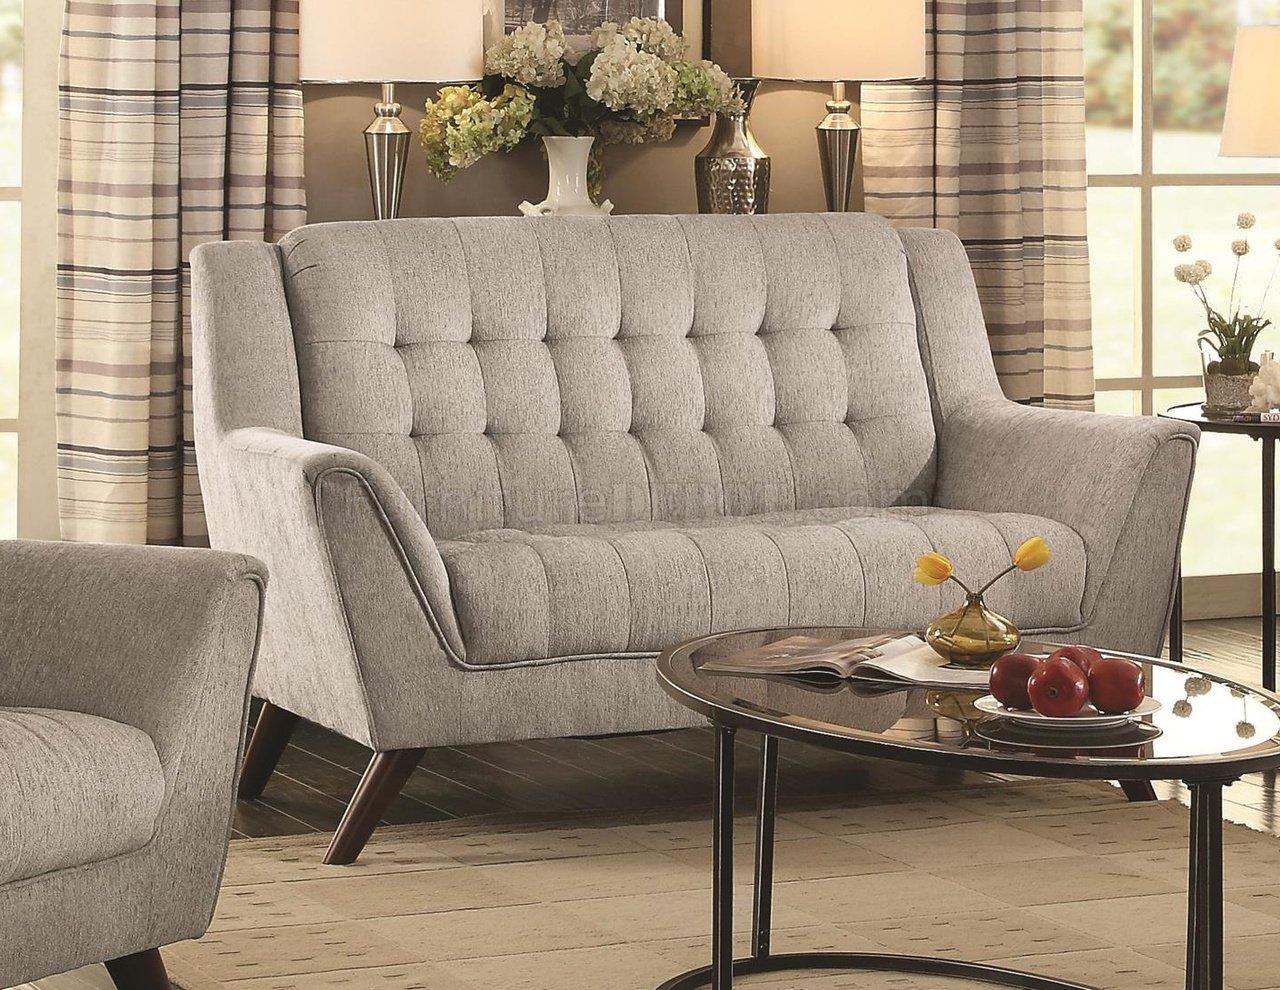 natalia leather and chenille sofa recliner fabric singapore 1465 10 retro black 2 pc